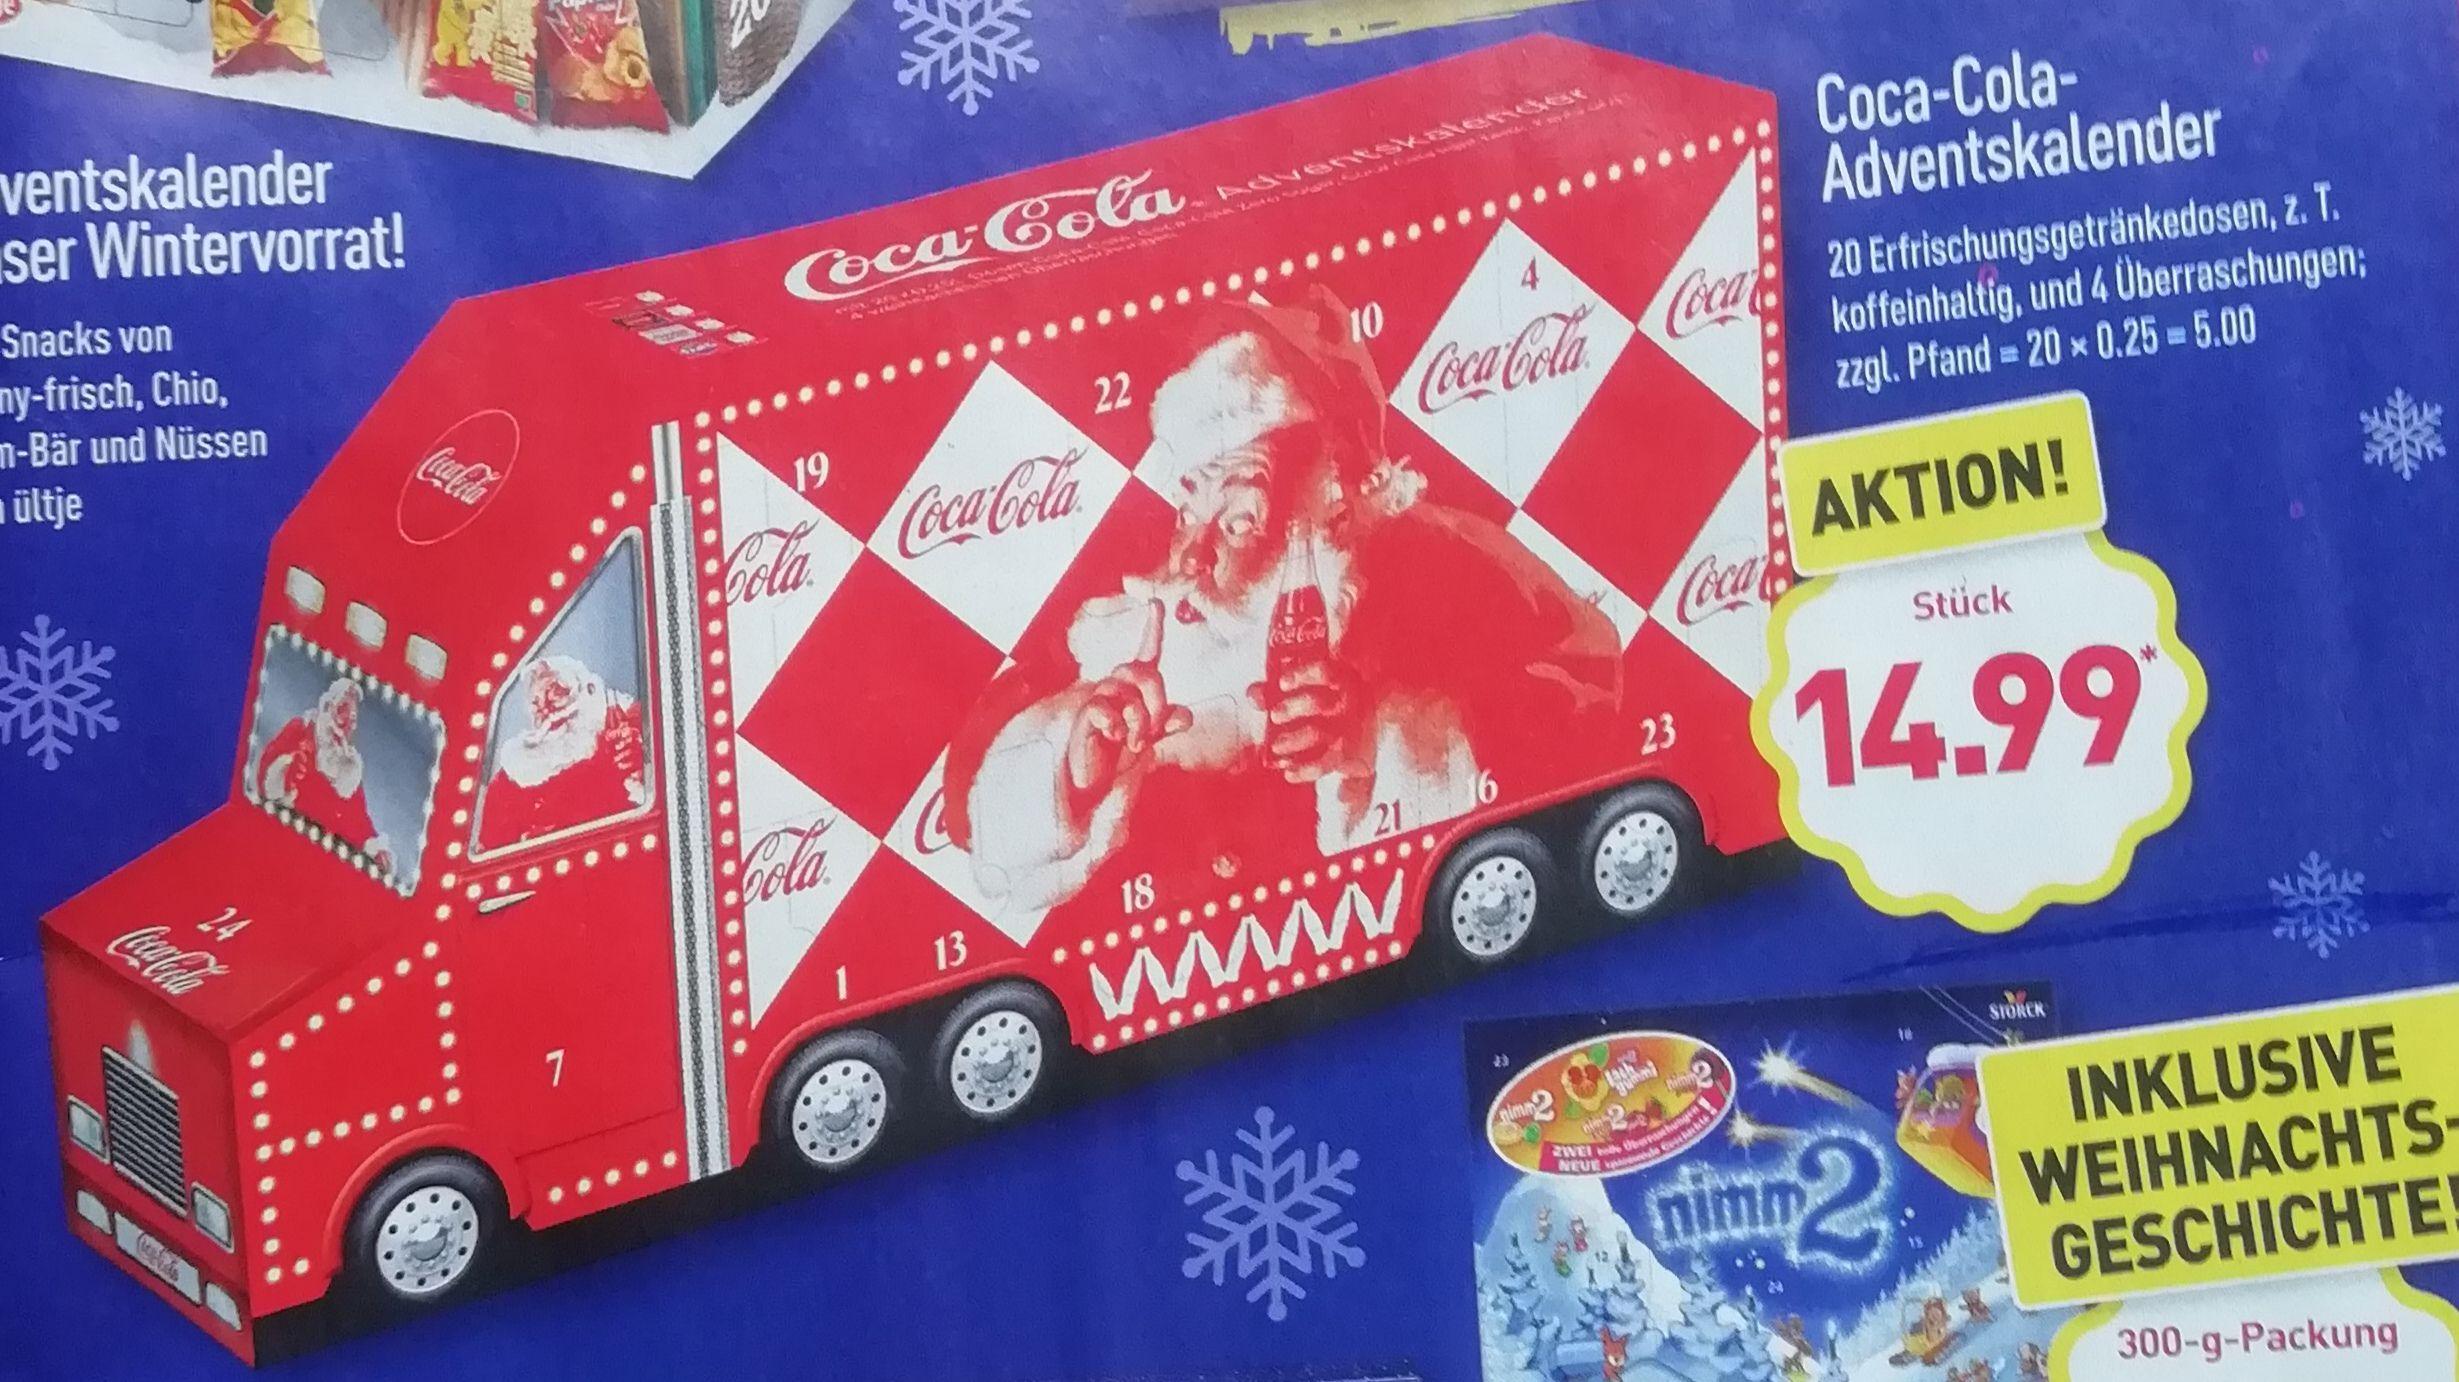 [Aldi Nord ab 1.11] Coca Cola Adventskalender|Adventskalender Unser Wintervorrat!|nimm 2 Adventskalender|Milka und Oreo Adventskalender